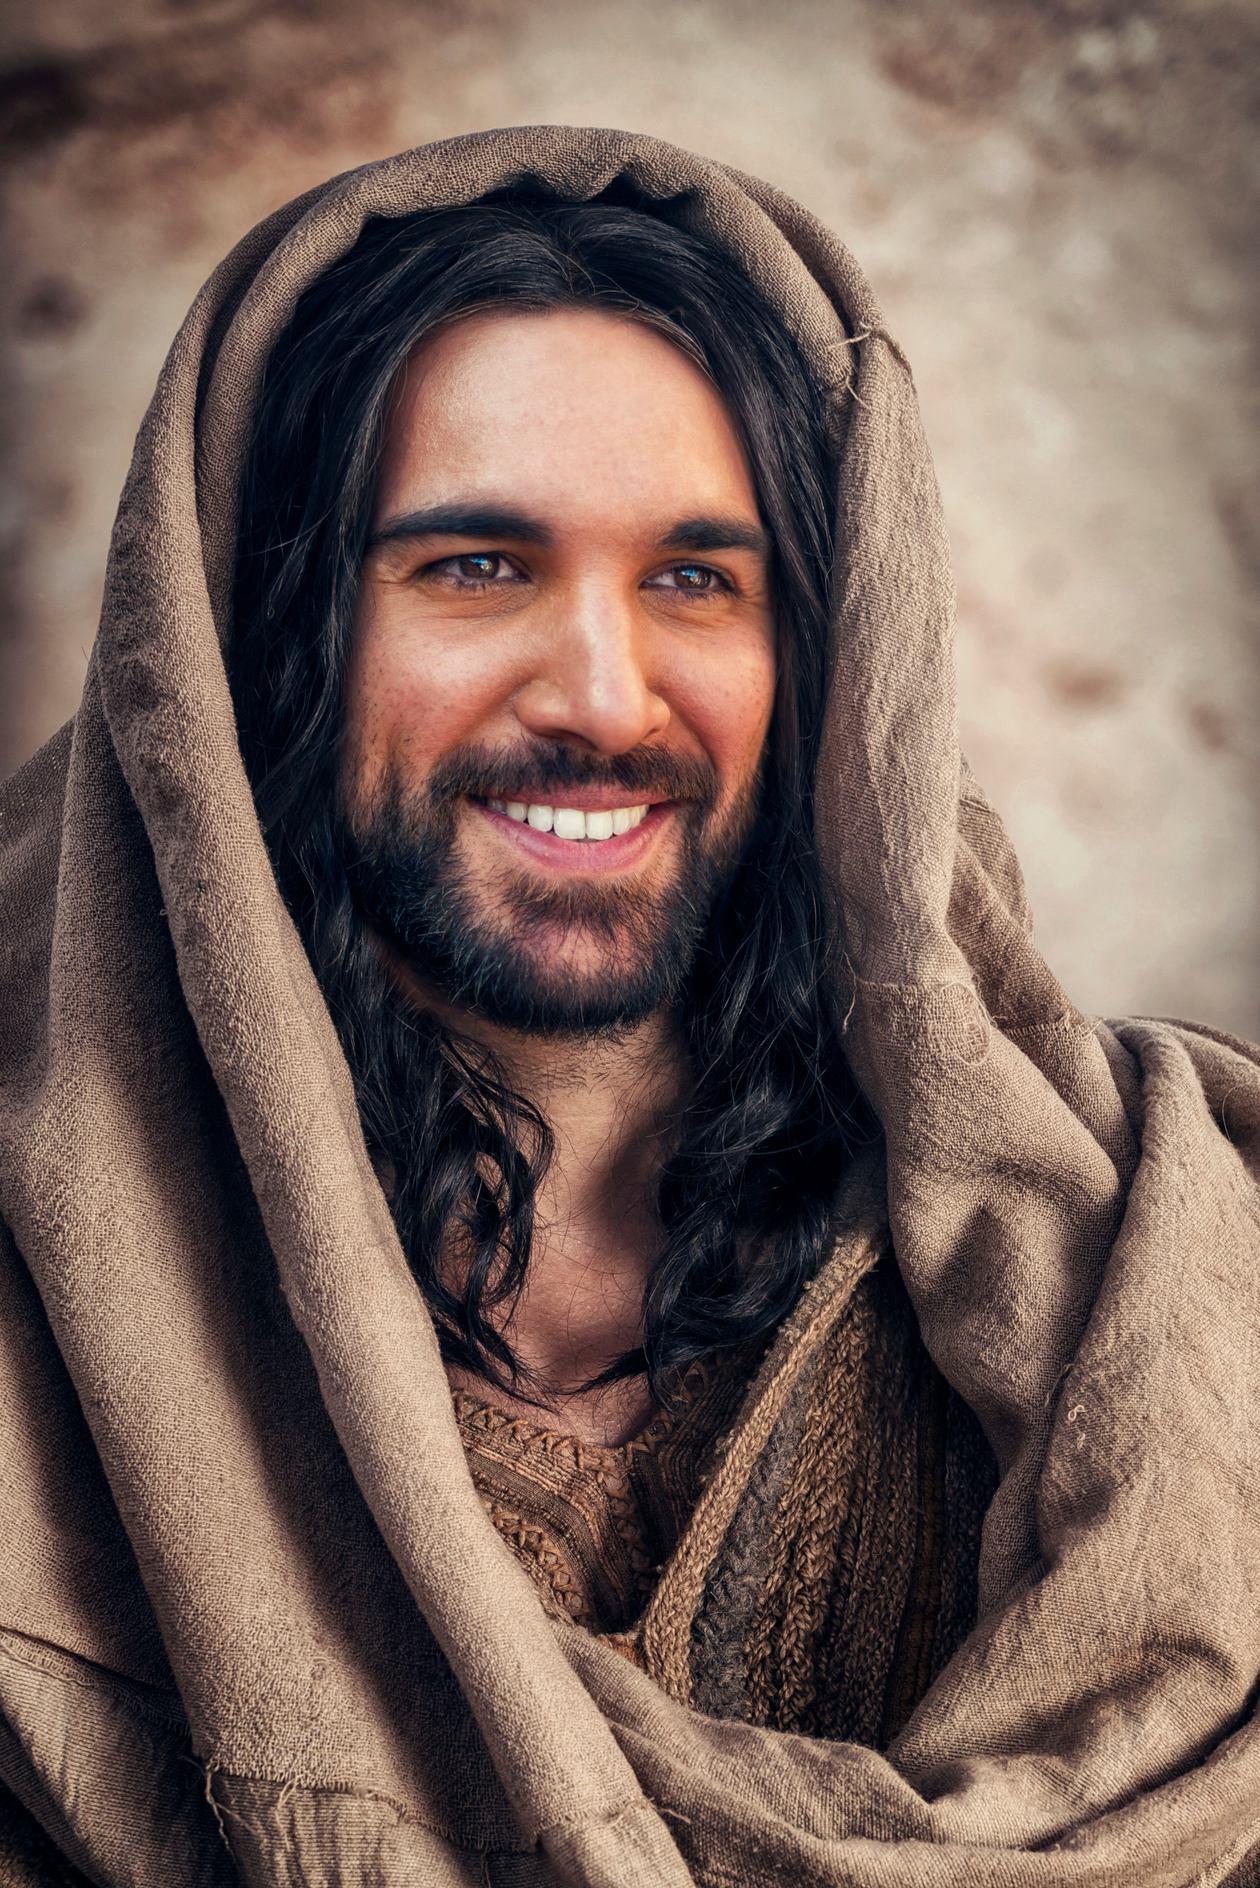 Jesus from Resurrection movie